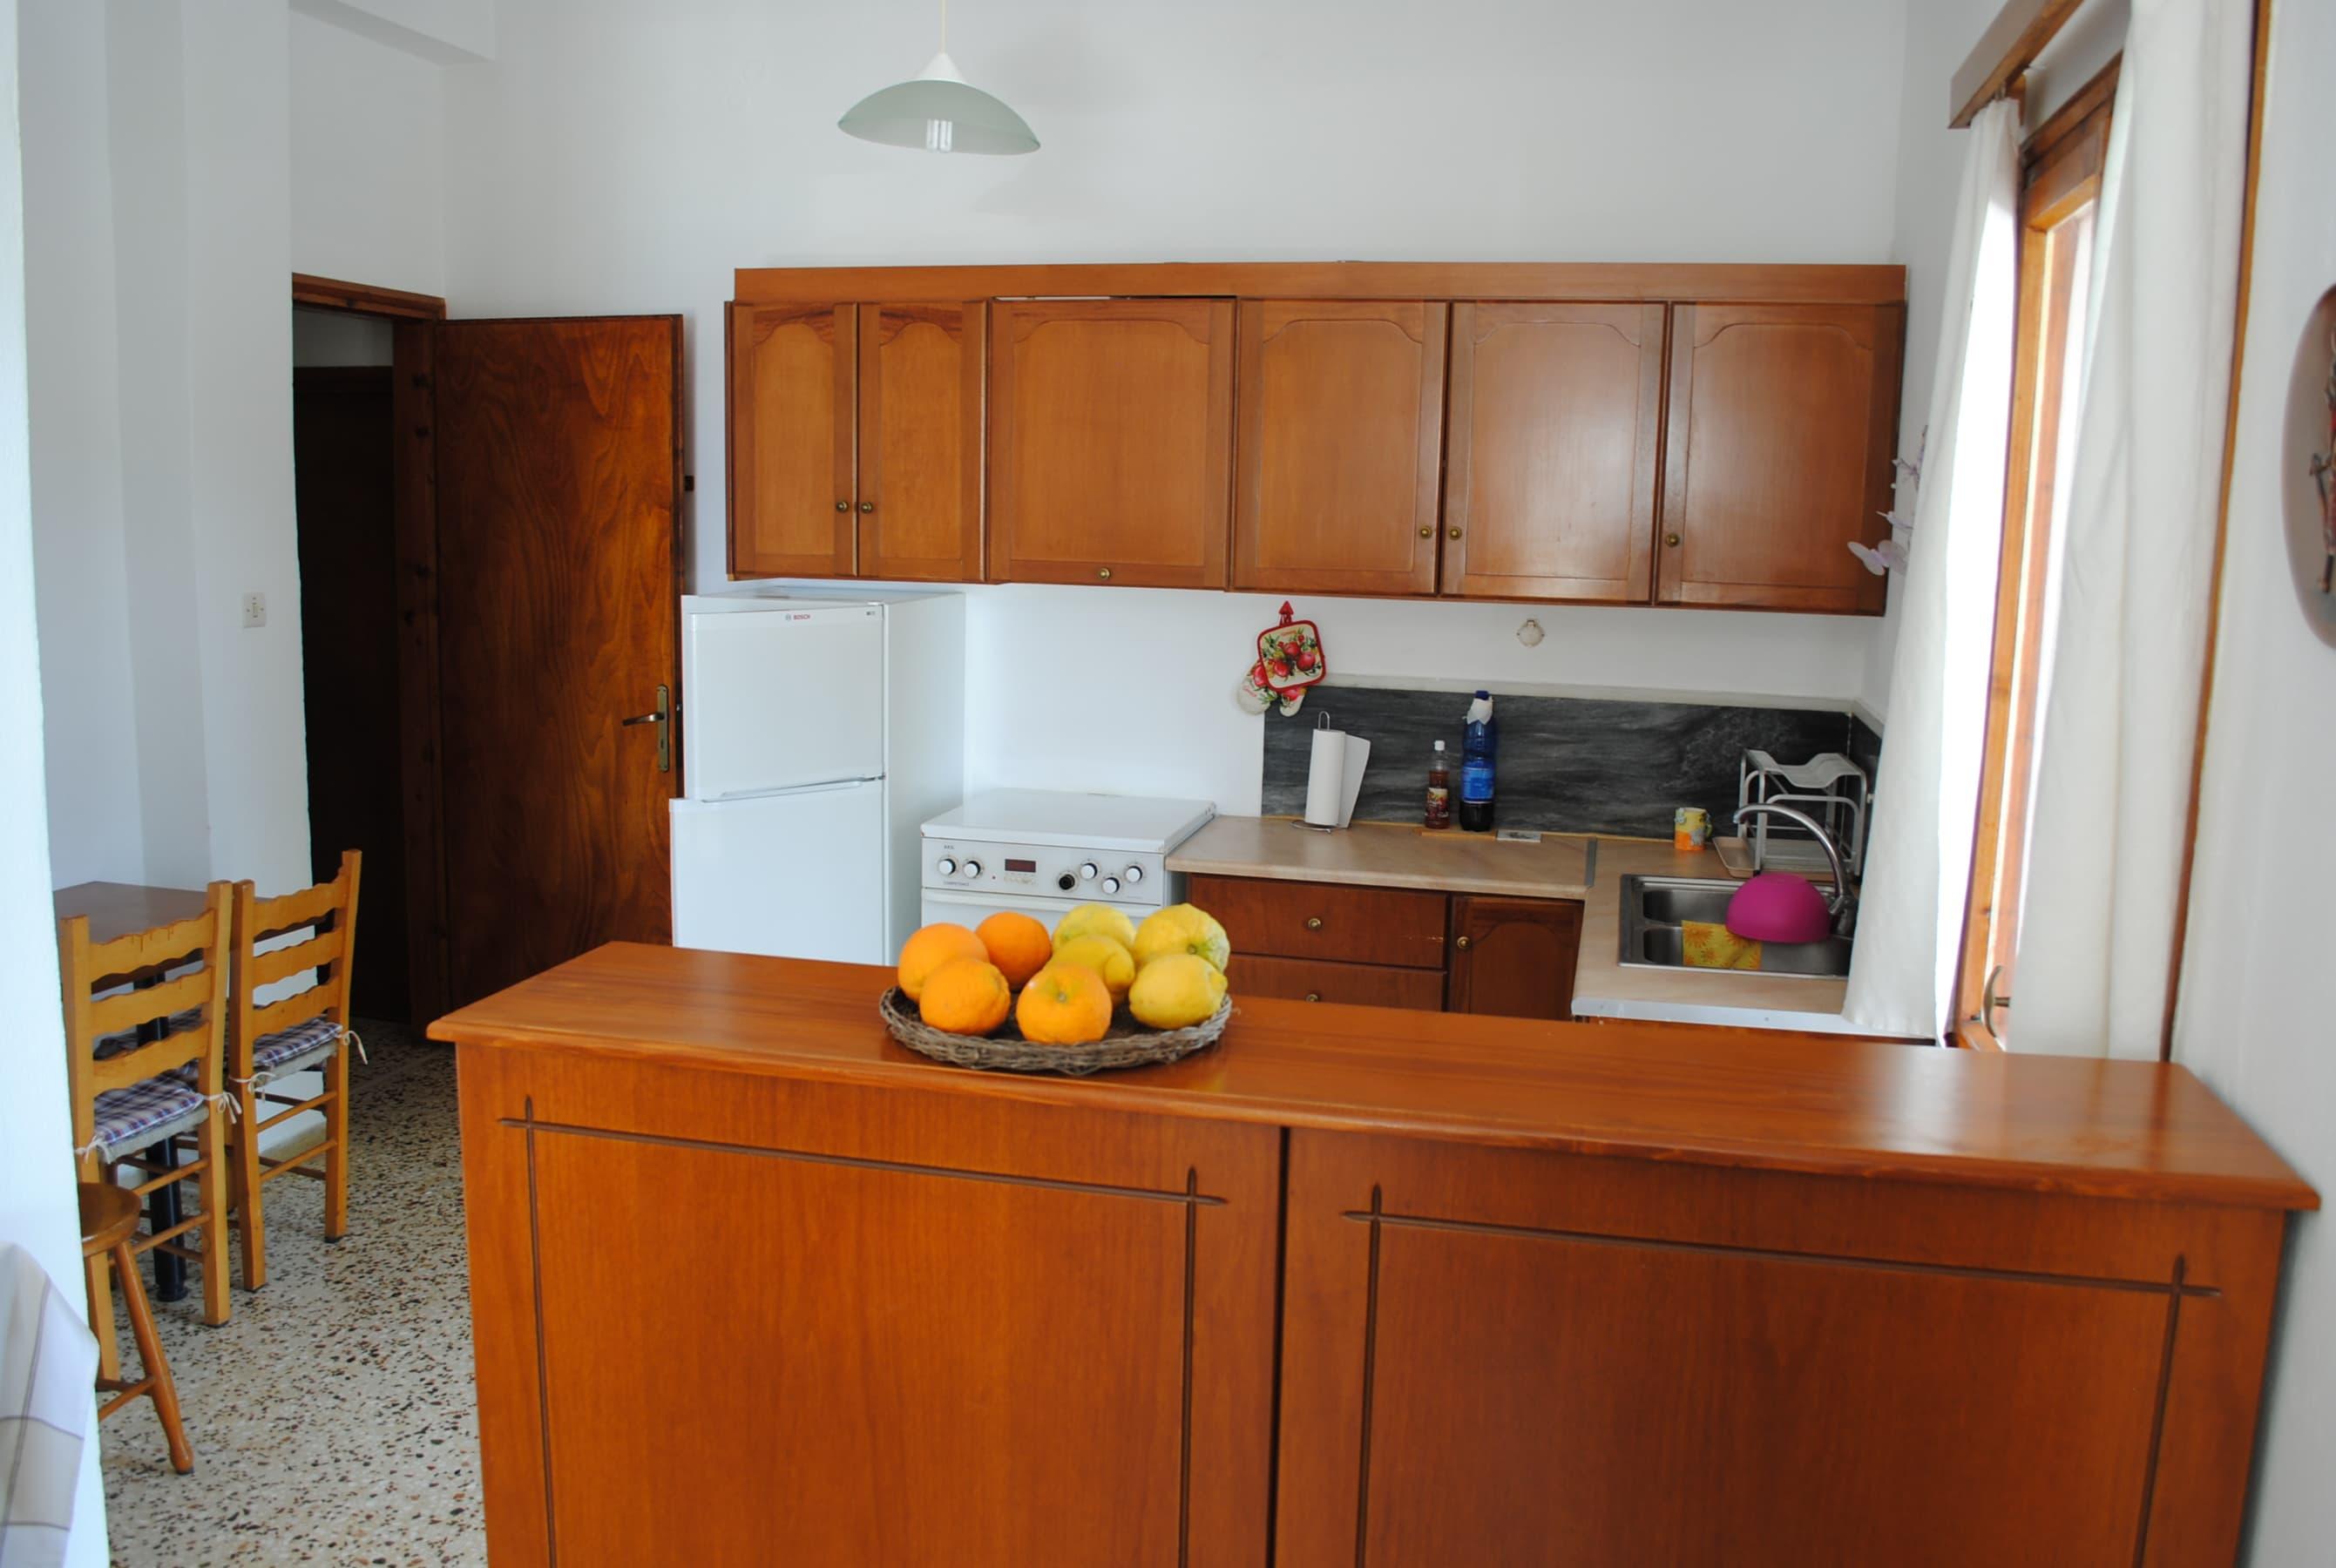 2 cucina 1